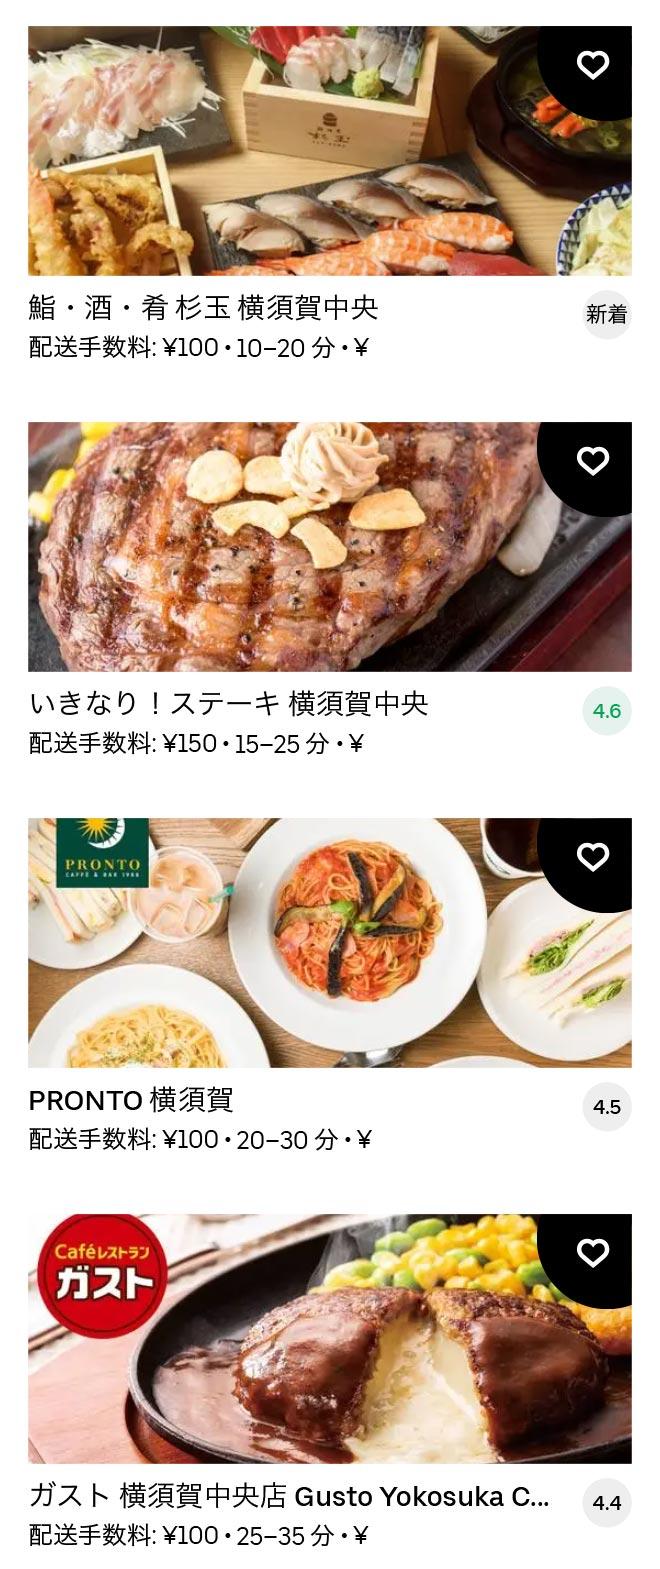 Yokosuka chuo menu 2011 07